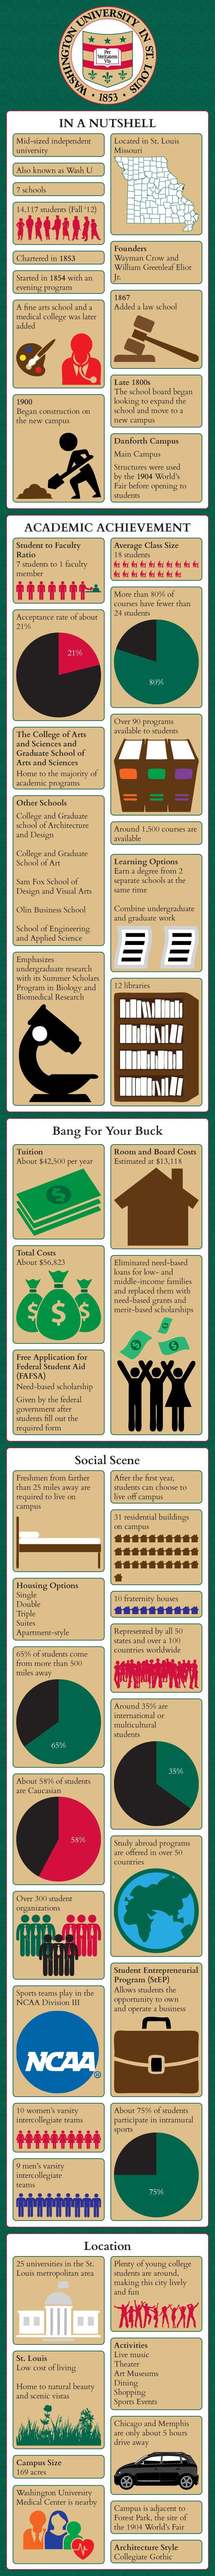 Washington University in St. Louis Infographic